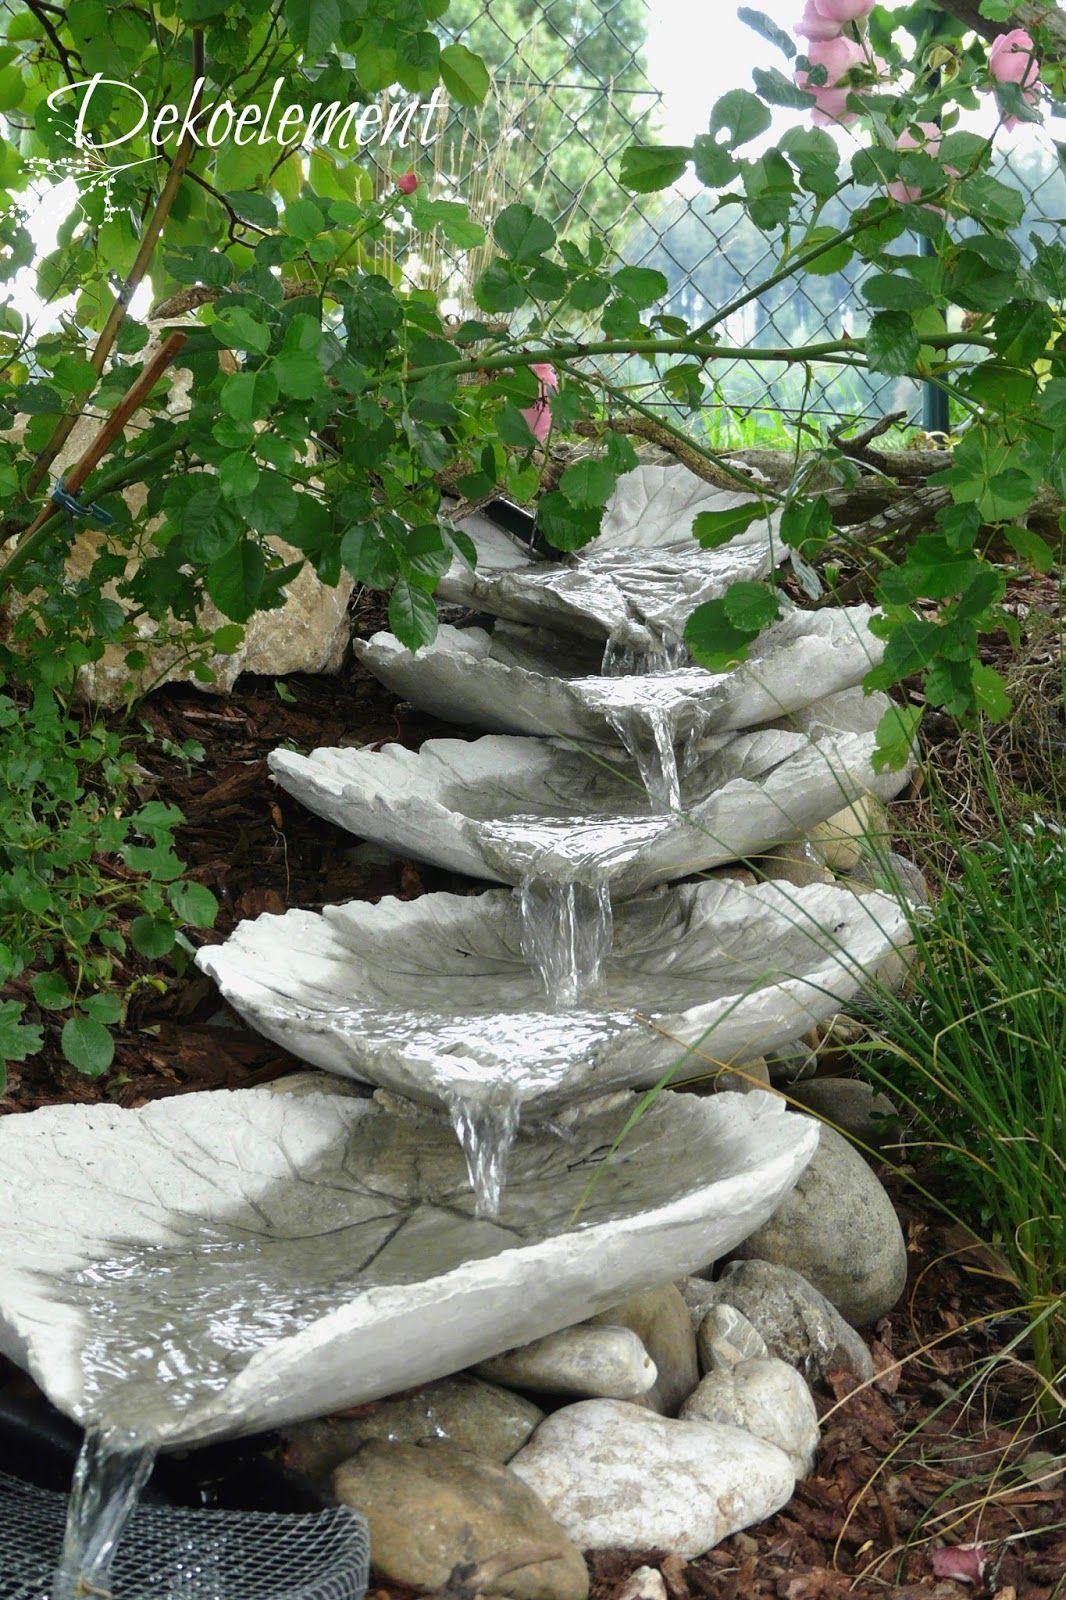 Betonblätter, Bachlauf Garten, Bachlauf Selber Bauen, Bachlauf Gestalten  Sitzecken Garten, Garten Beton